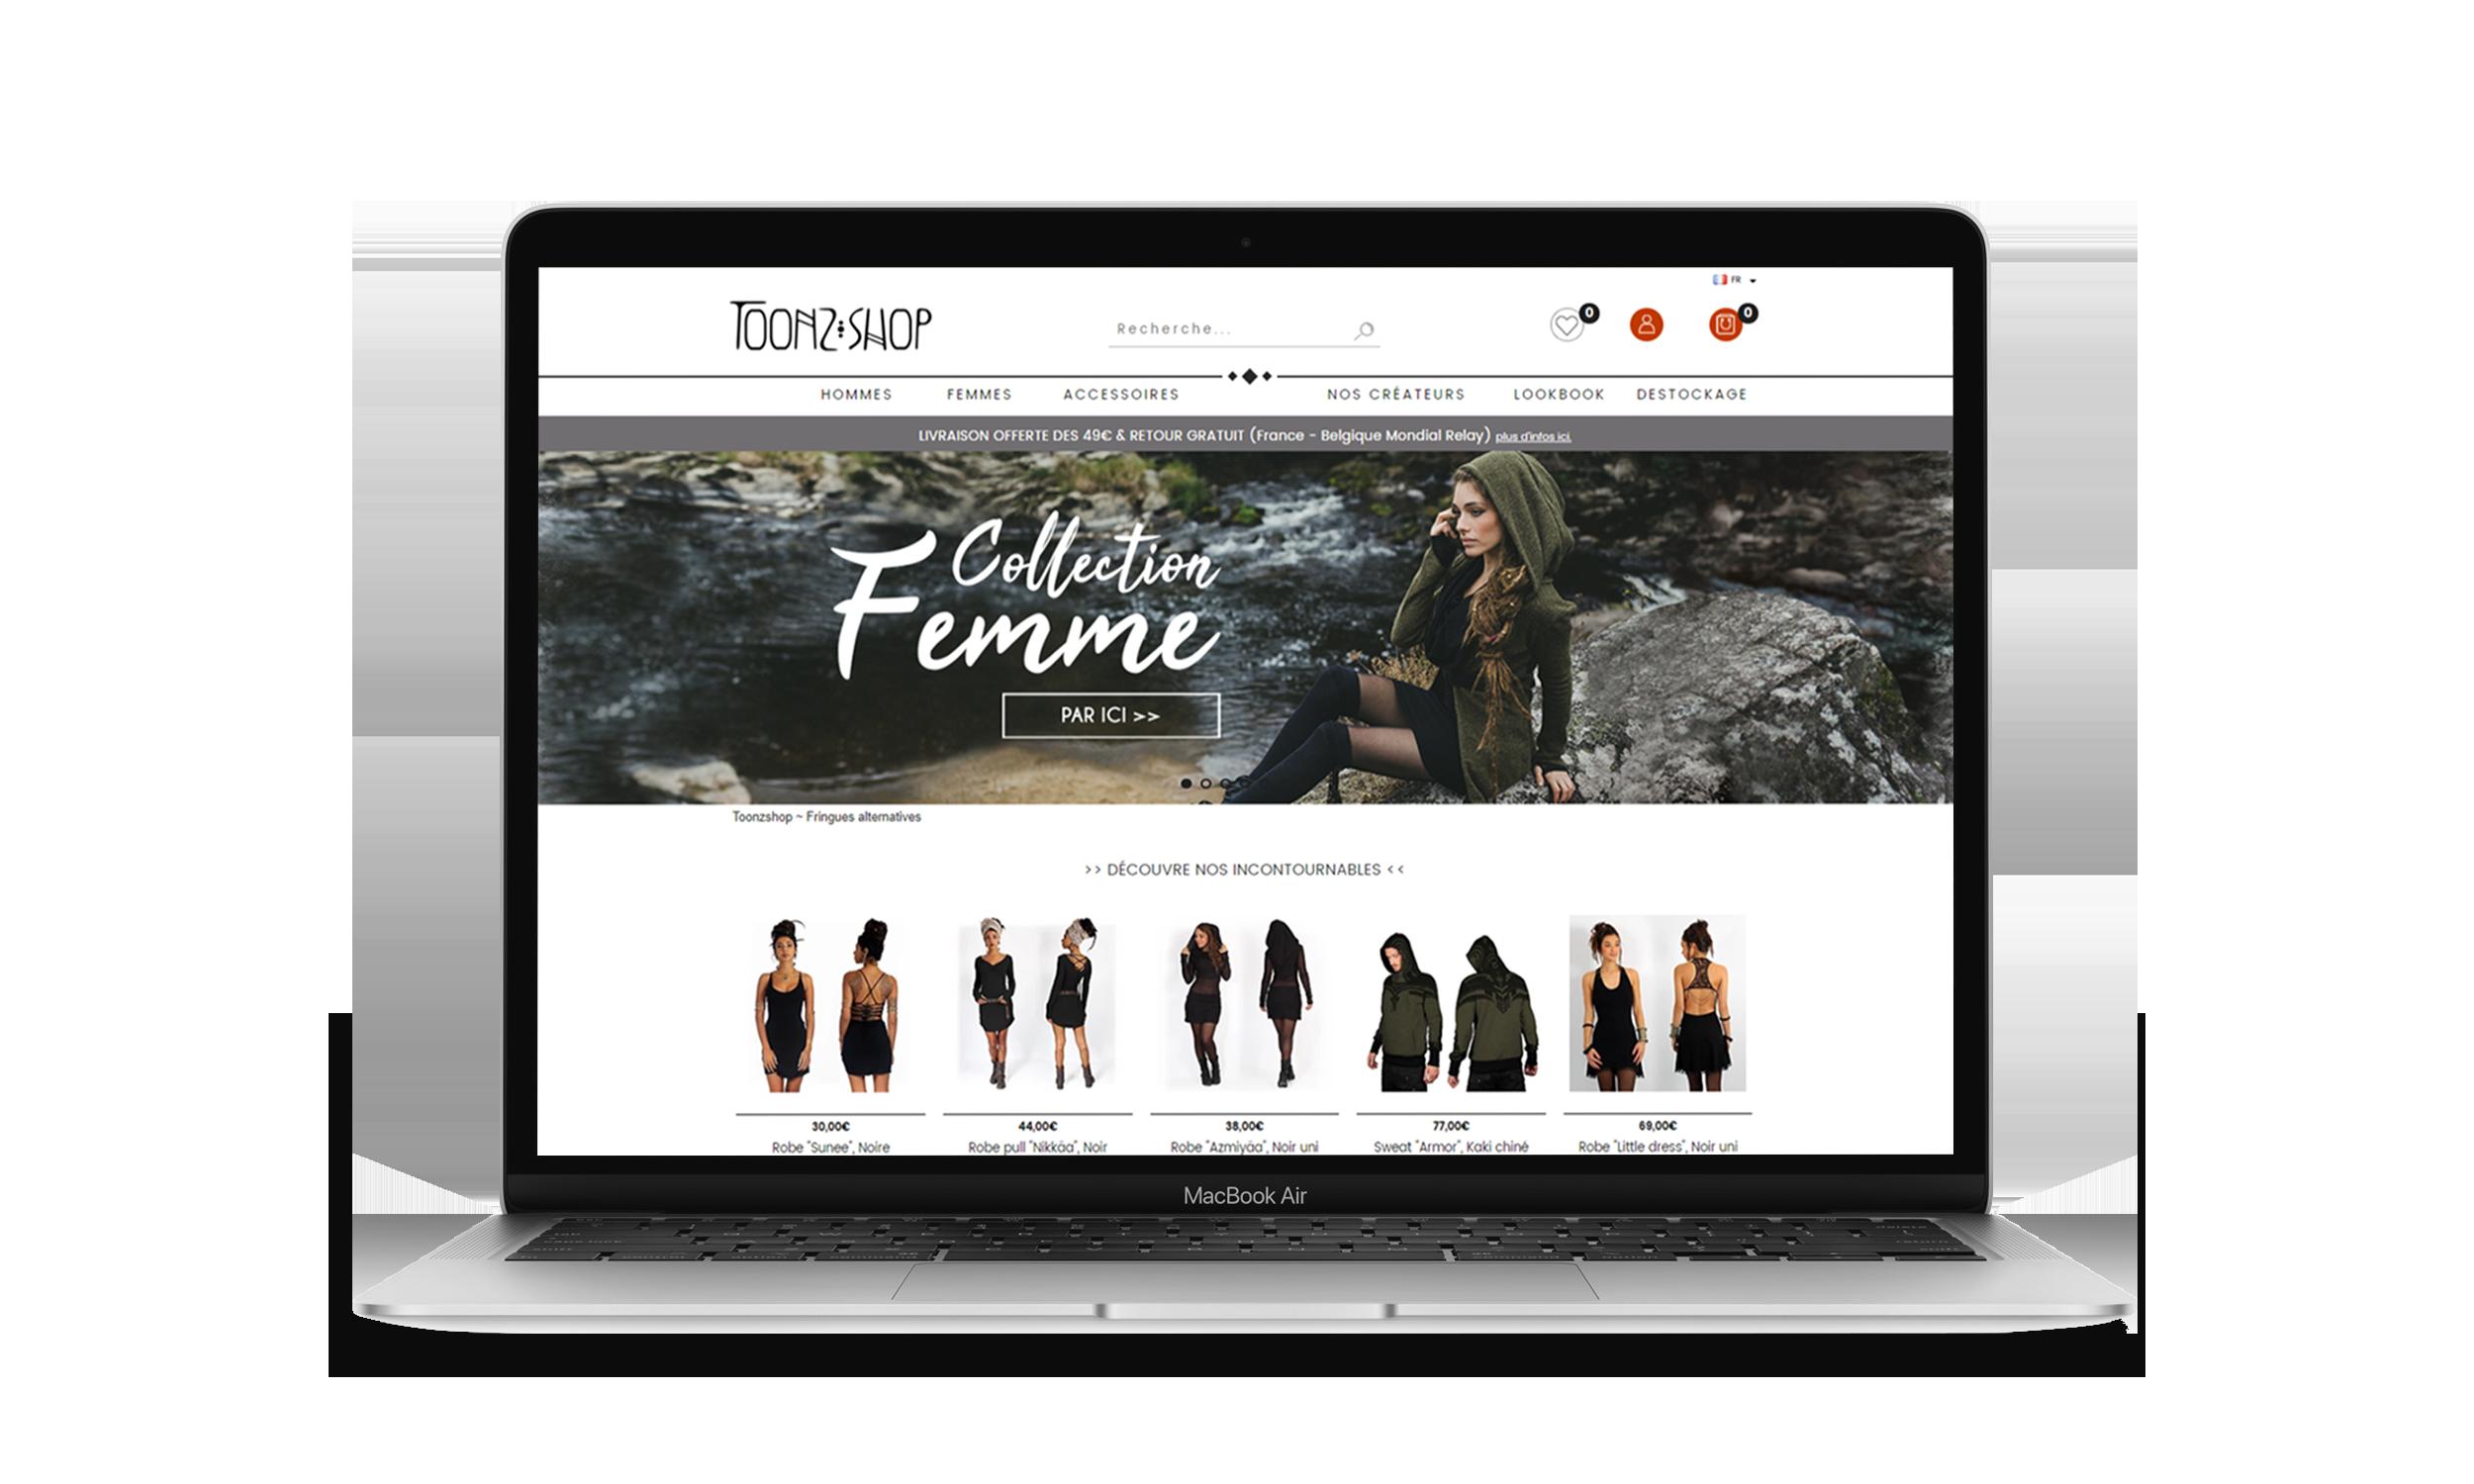 site-ecommerce-toonzshop